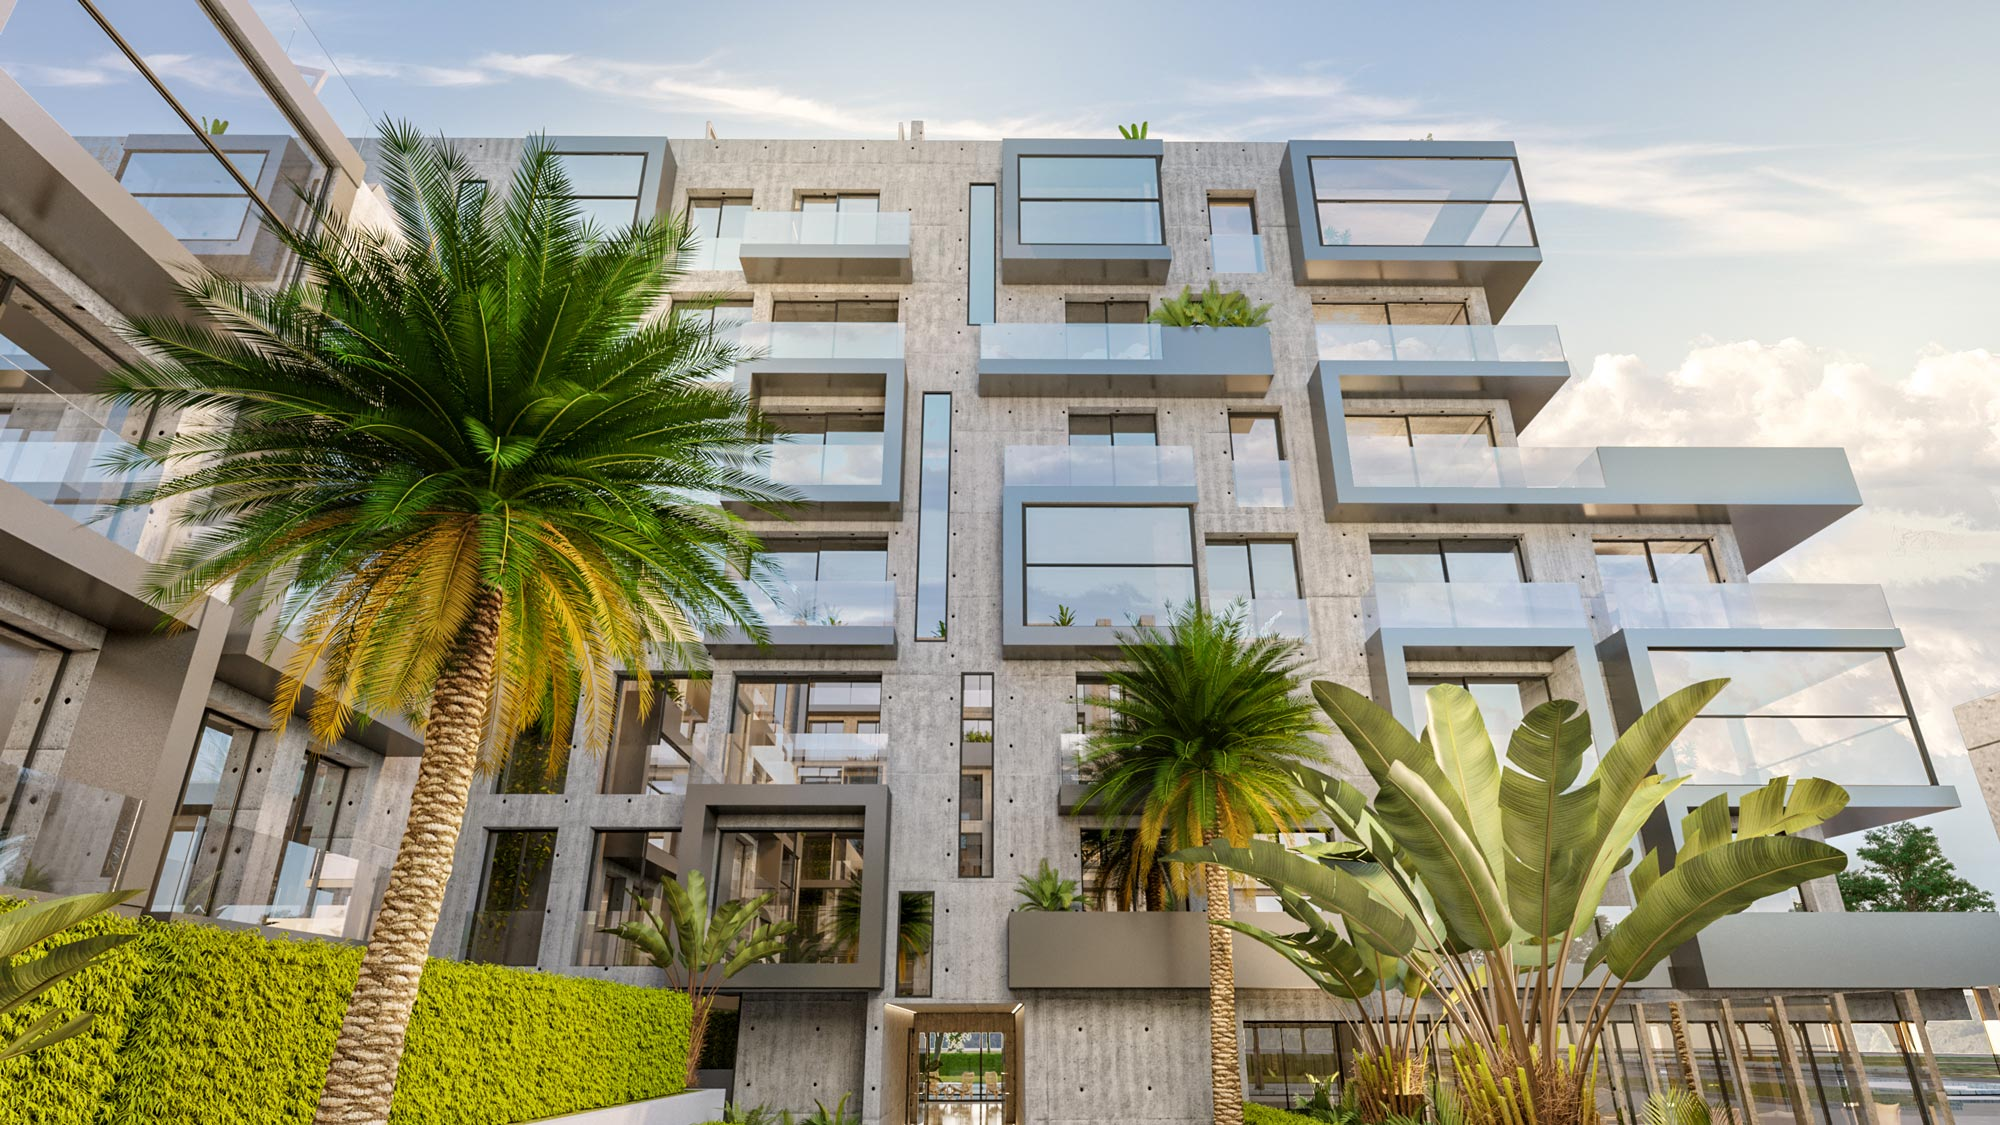 XO residences Exterior 3D rendering